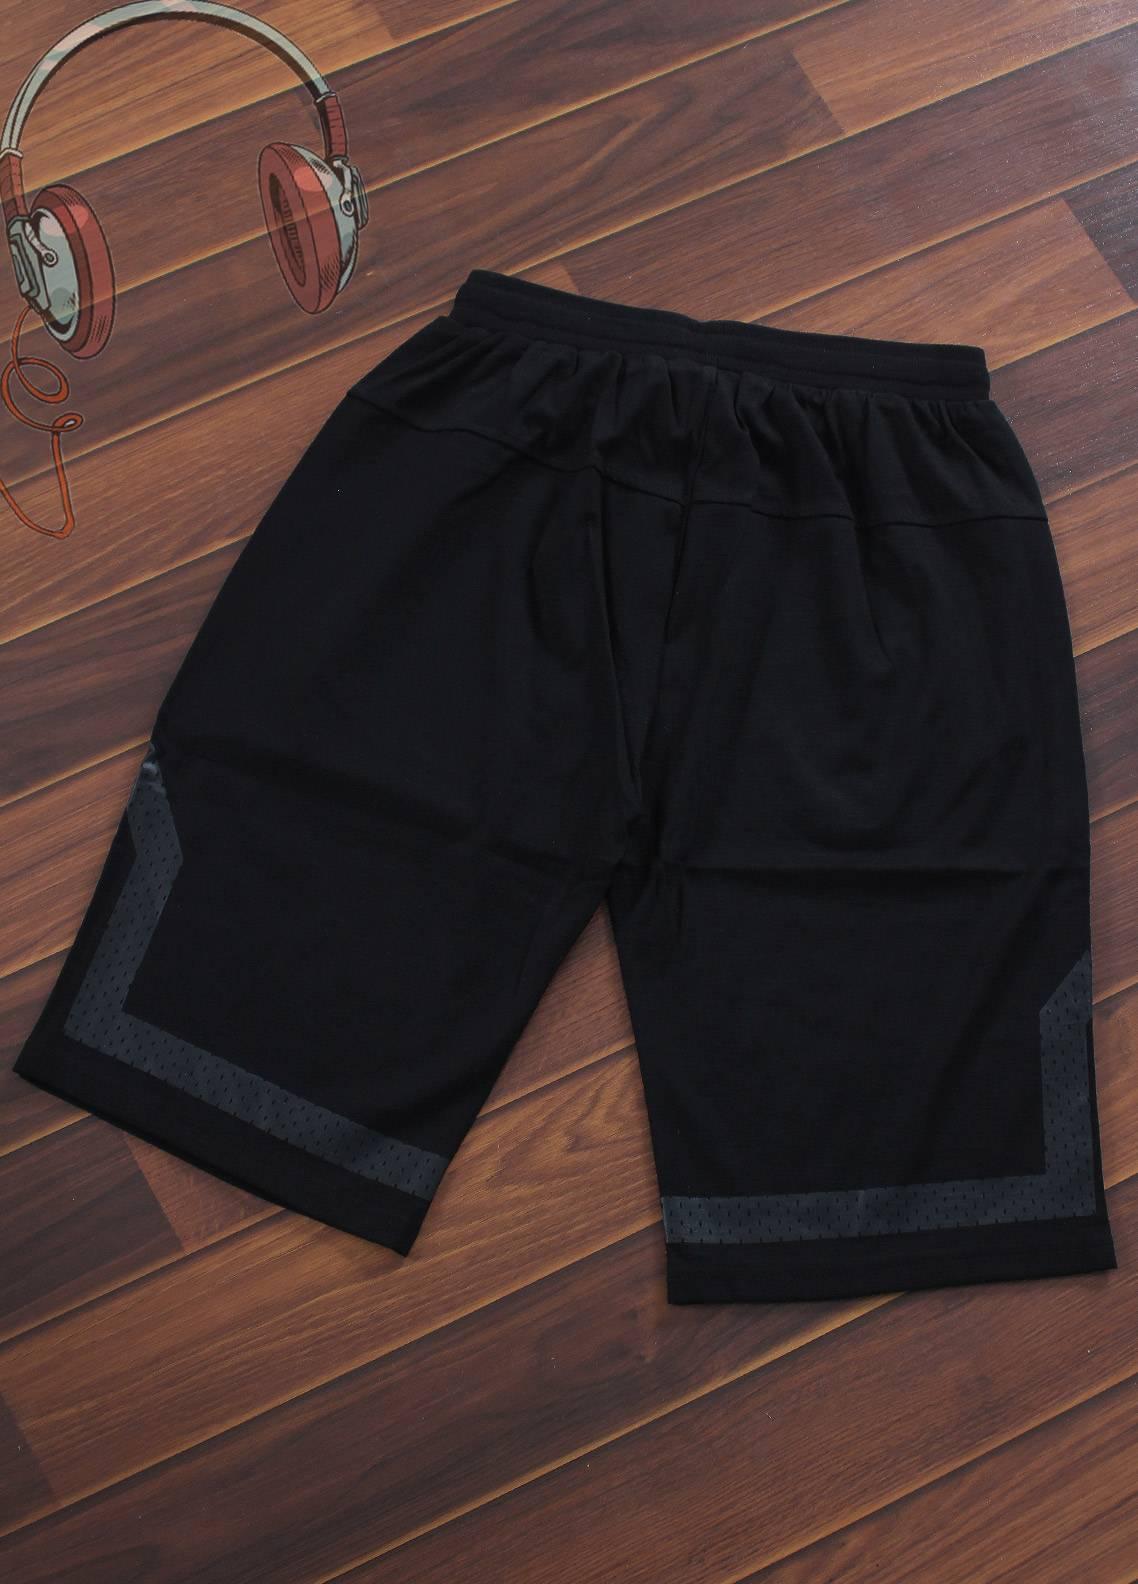 Sanaulla Exclusive Range Jersey Casual Shorts for Boys -  F038-Black